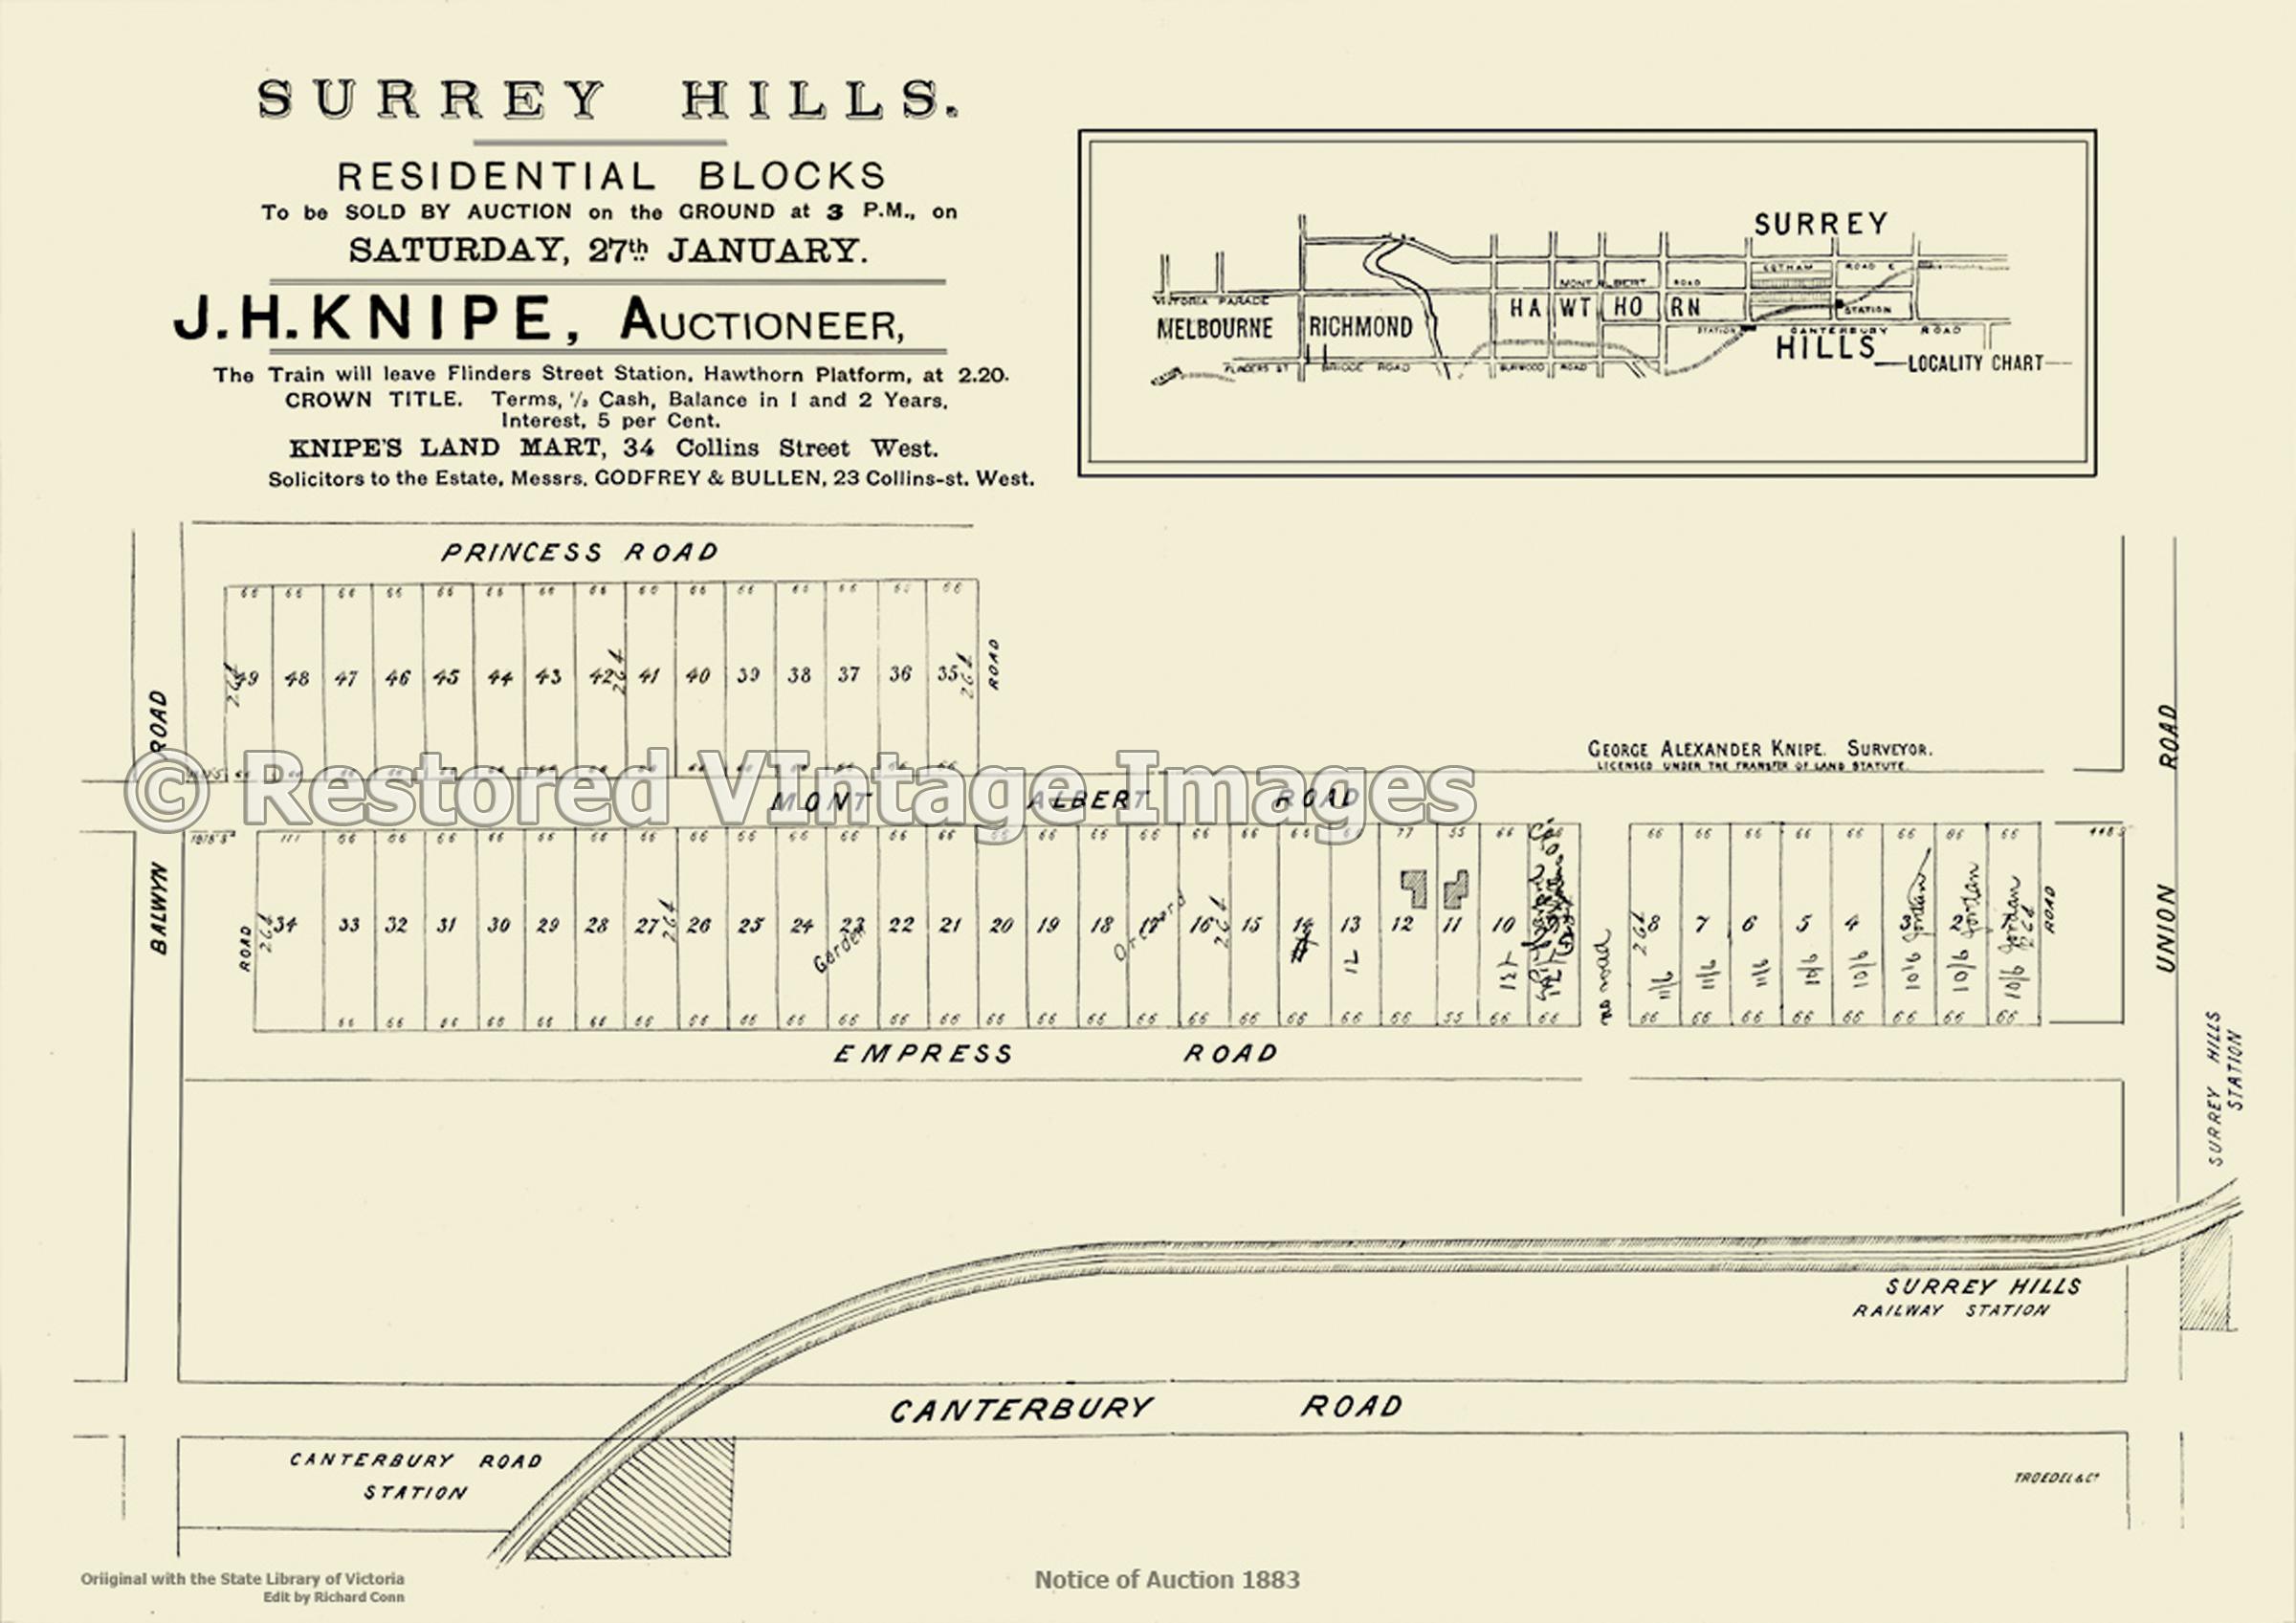 Surrey Hills Residential Blocks – 1883